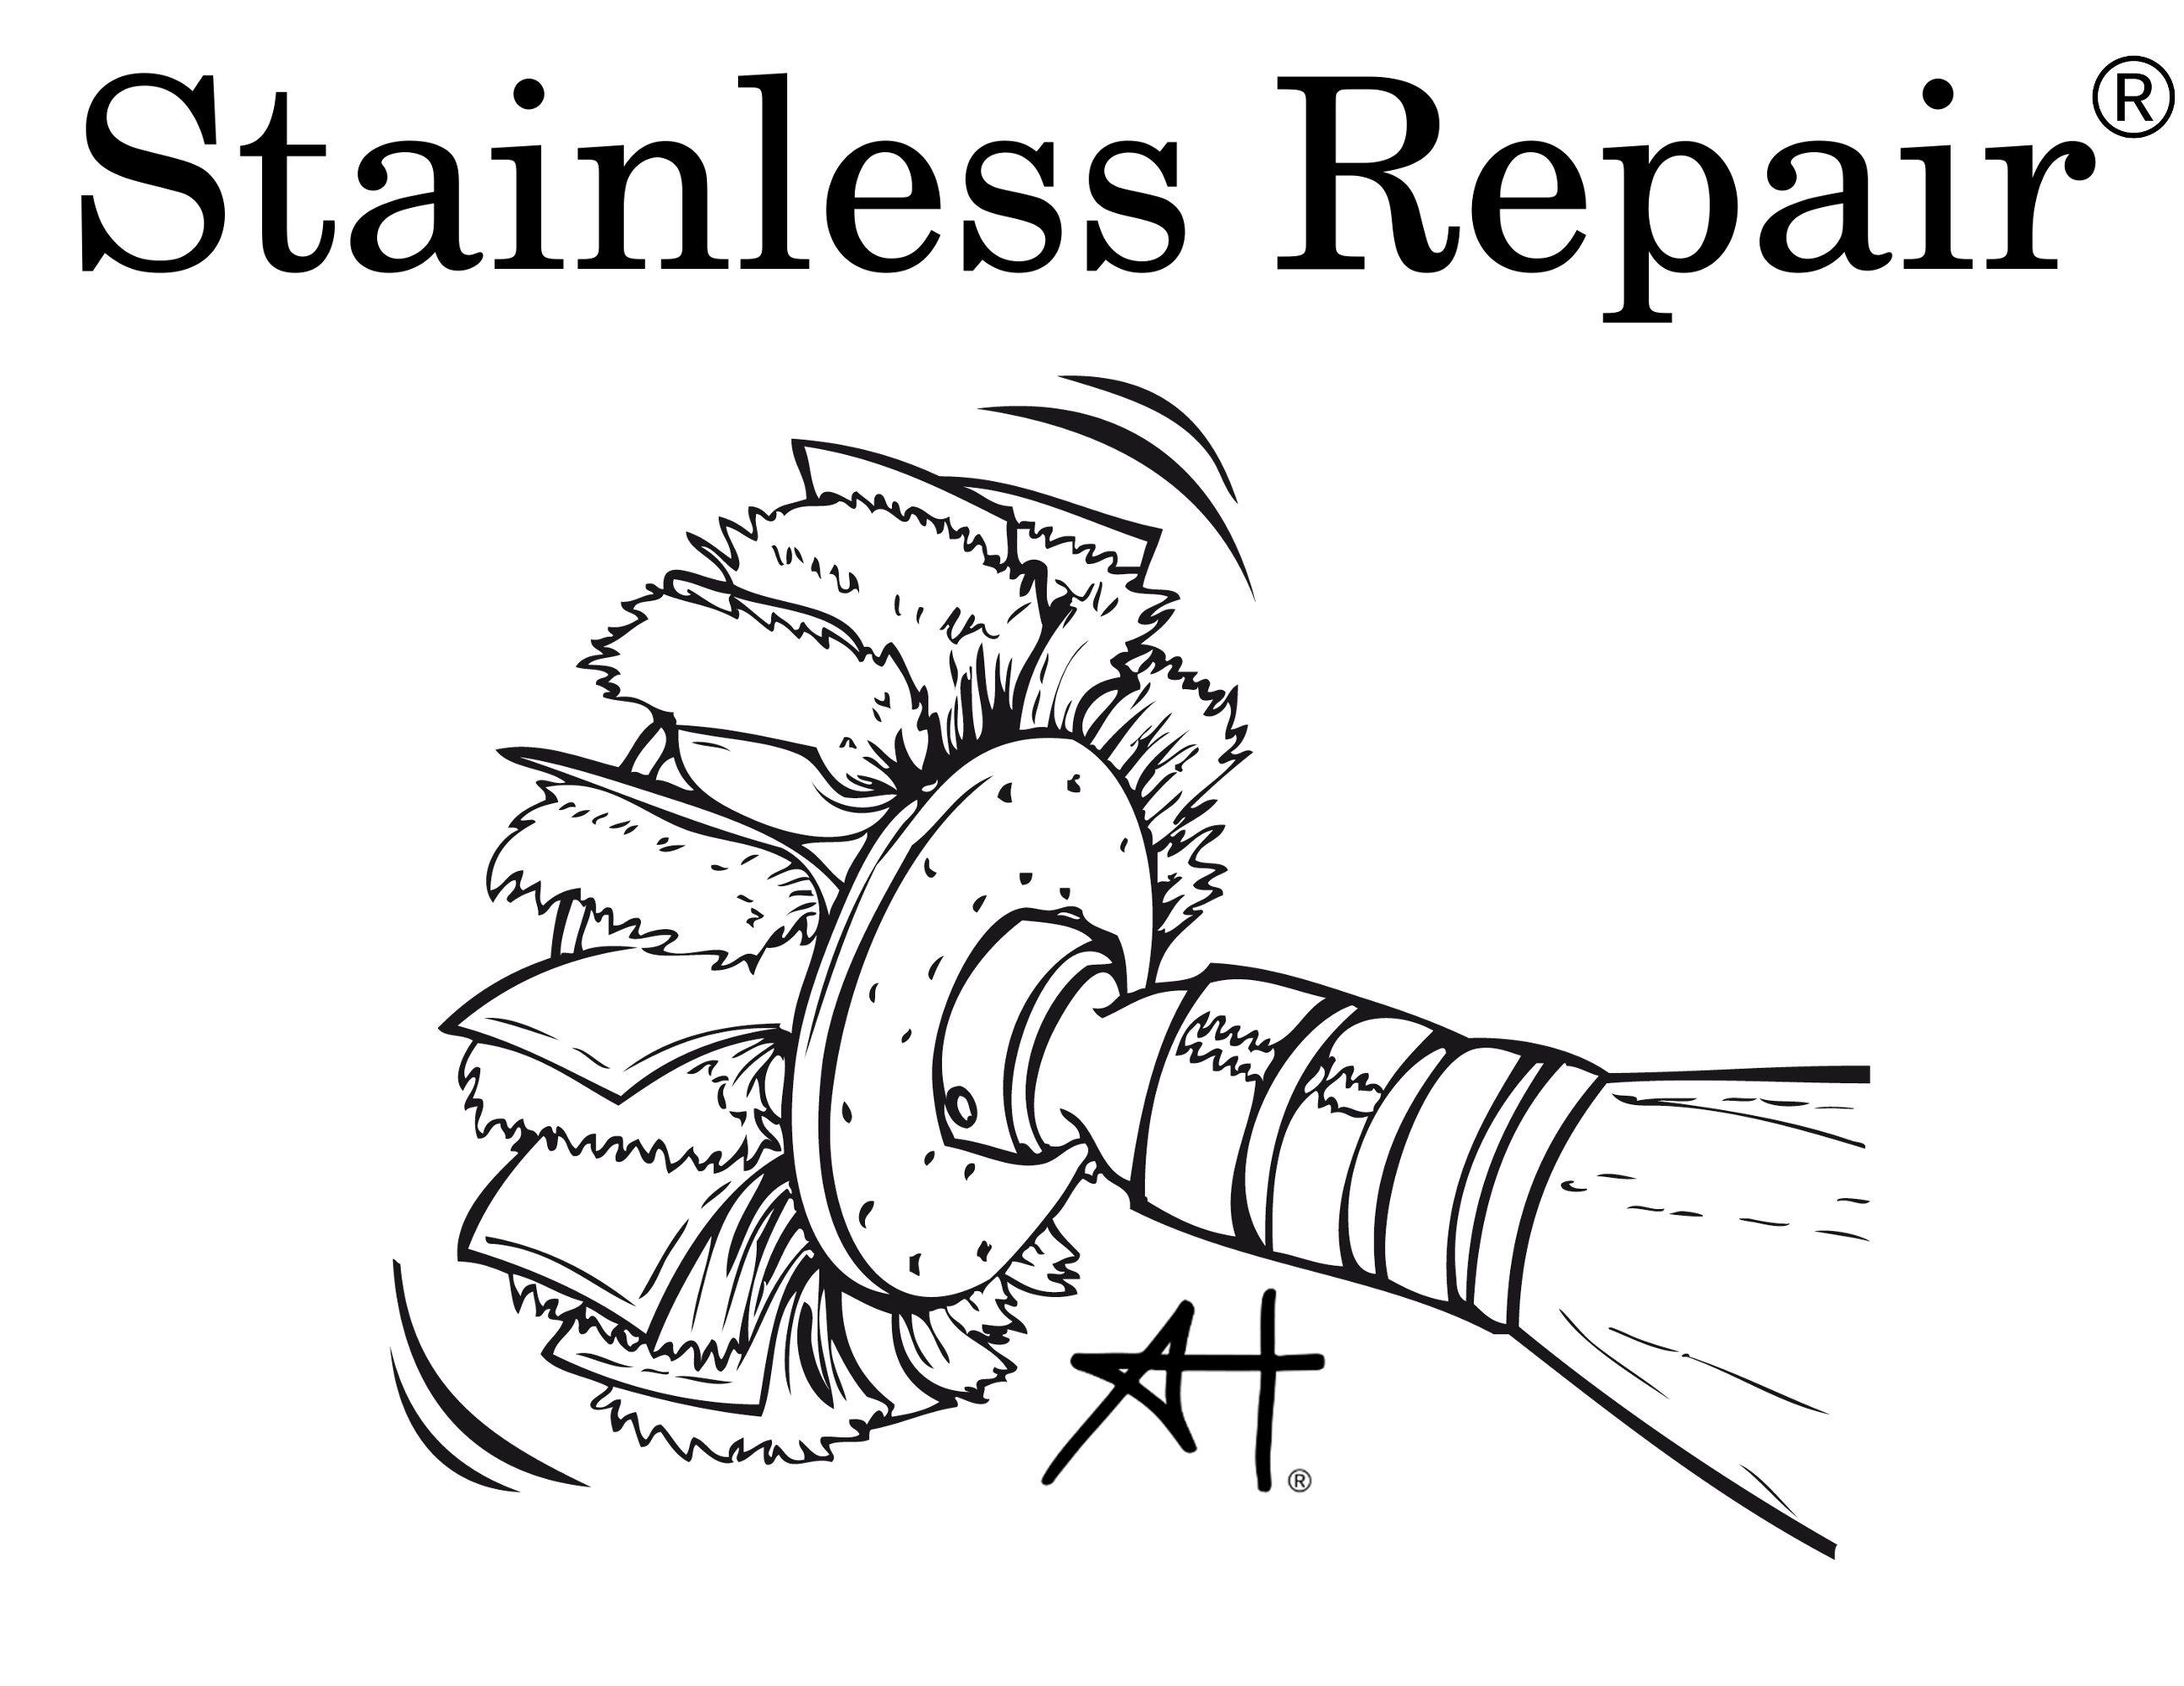 [CSDW_4250]   NC_7704] 1981 Delorean Wiring Diagram Delorean Dmc12 Owners Manuals Repair Schematic  Wiring | Delorean Wiring Diagrams |  | Inrebe Hyedi Mohammedshrine Librar Wiring 101